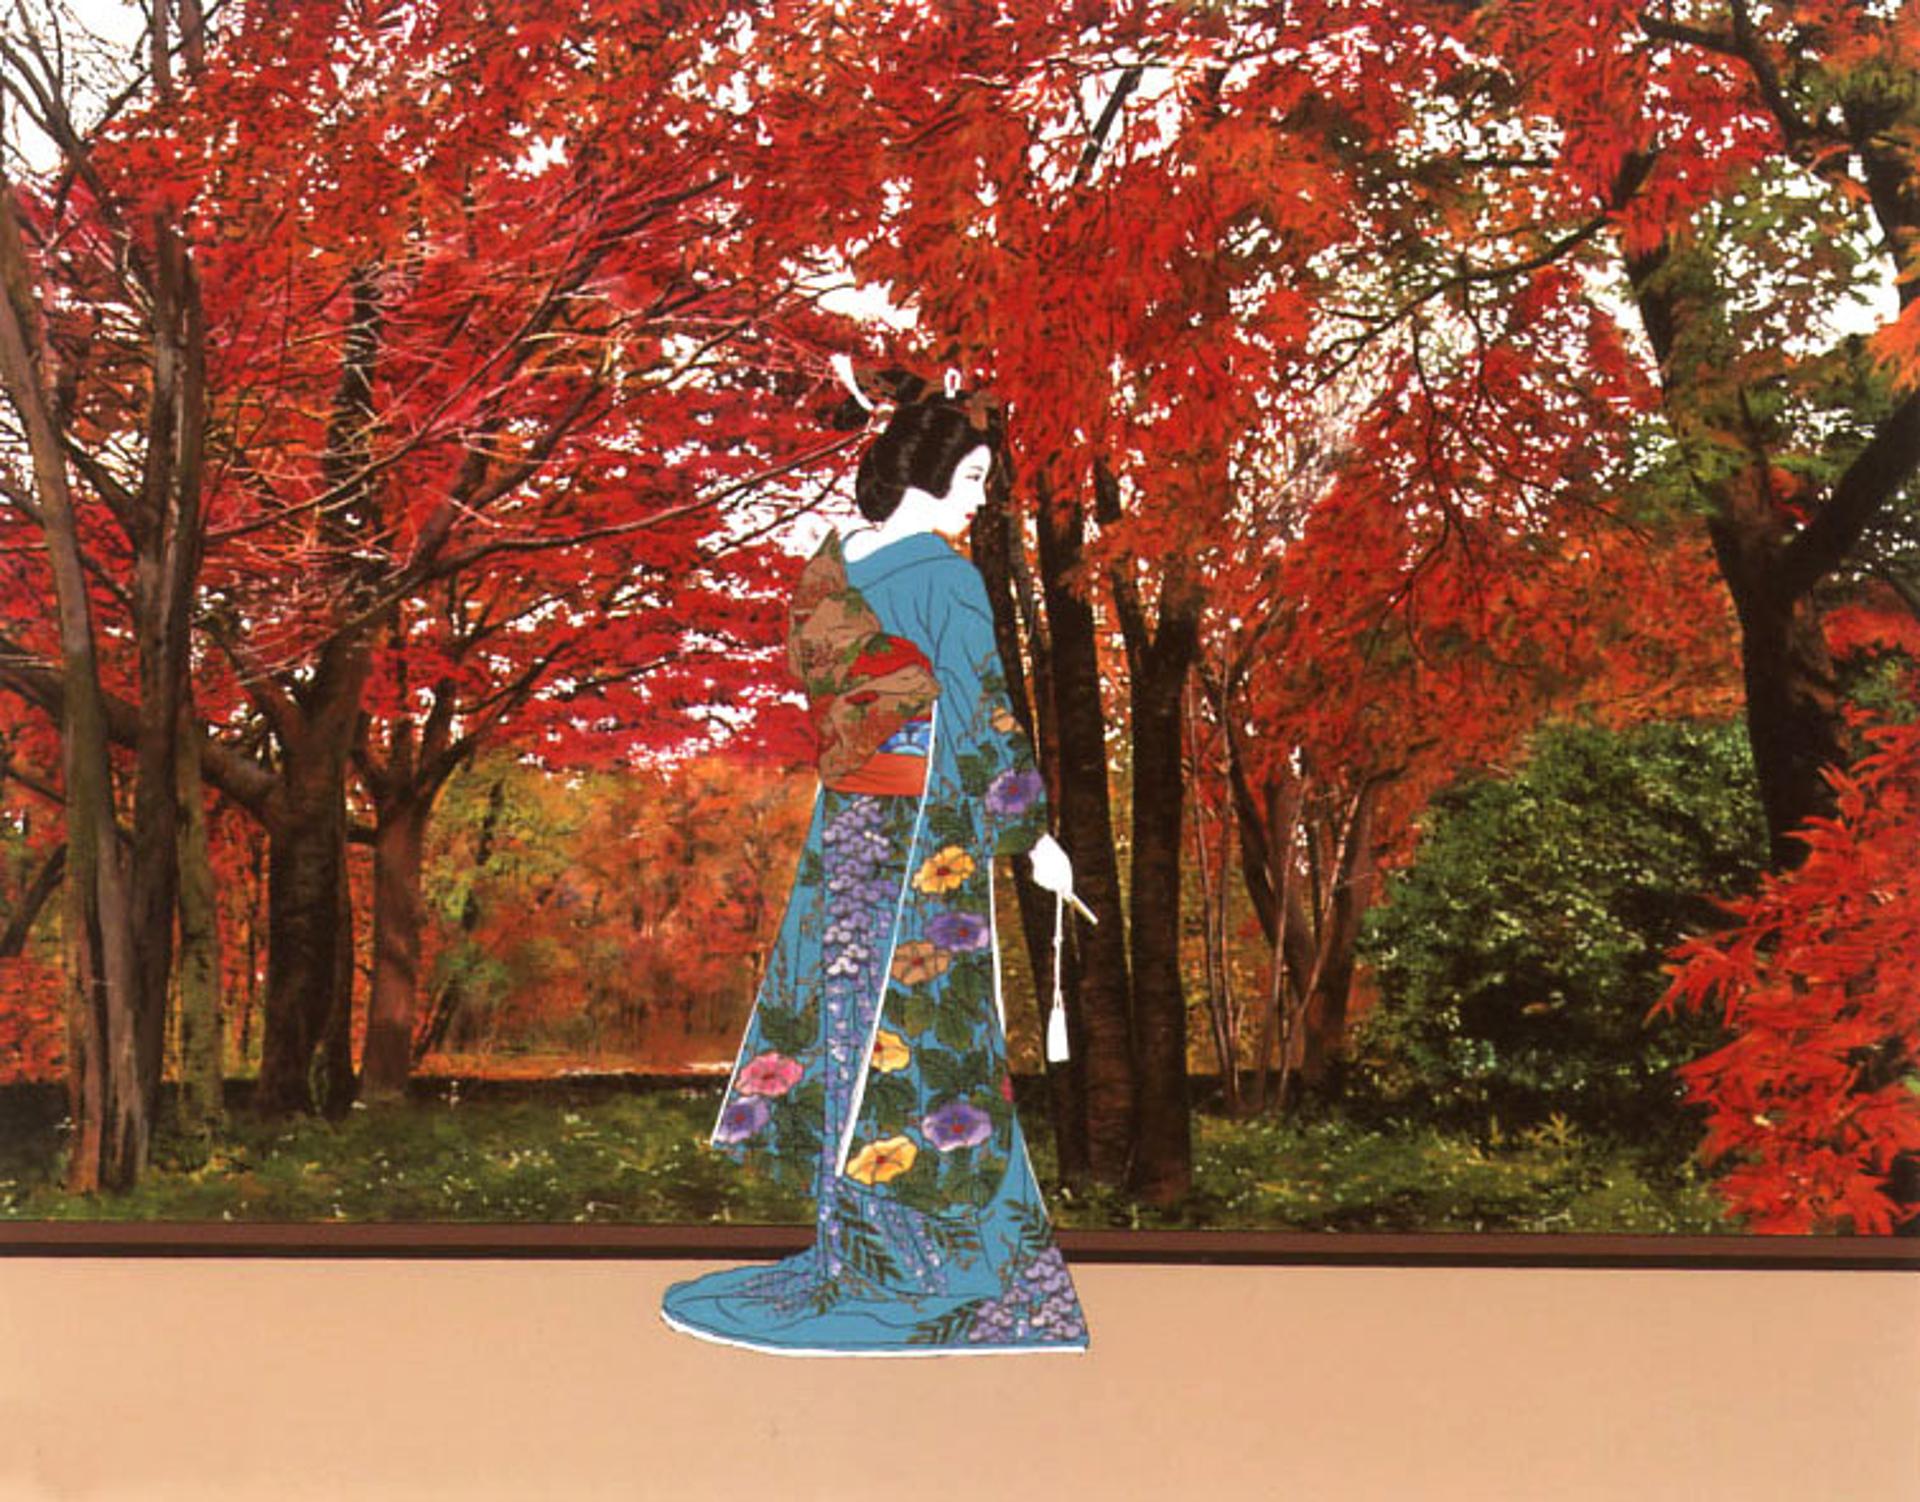 Bride Of Splendor by Hisashi Otsuka